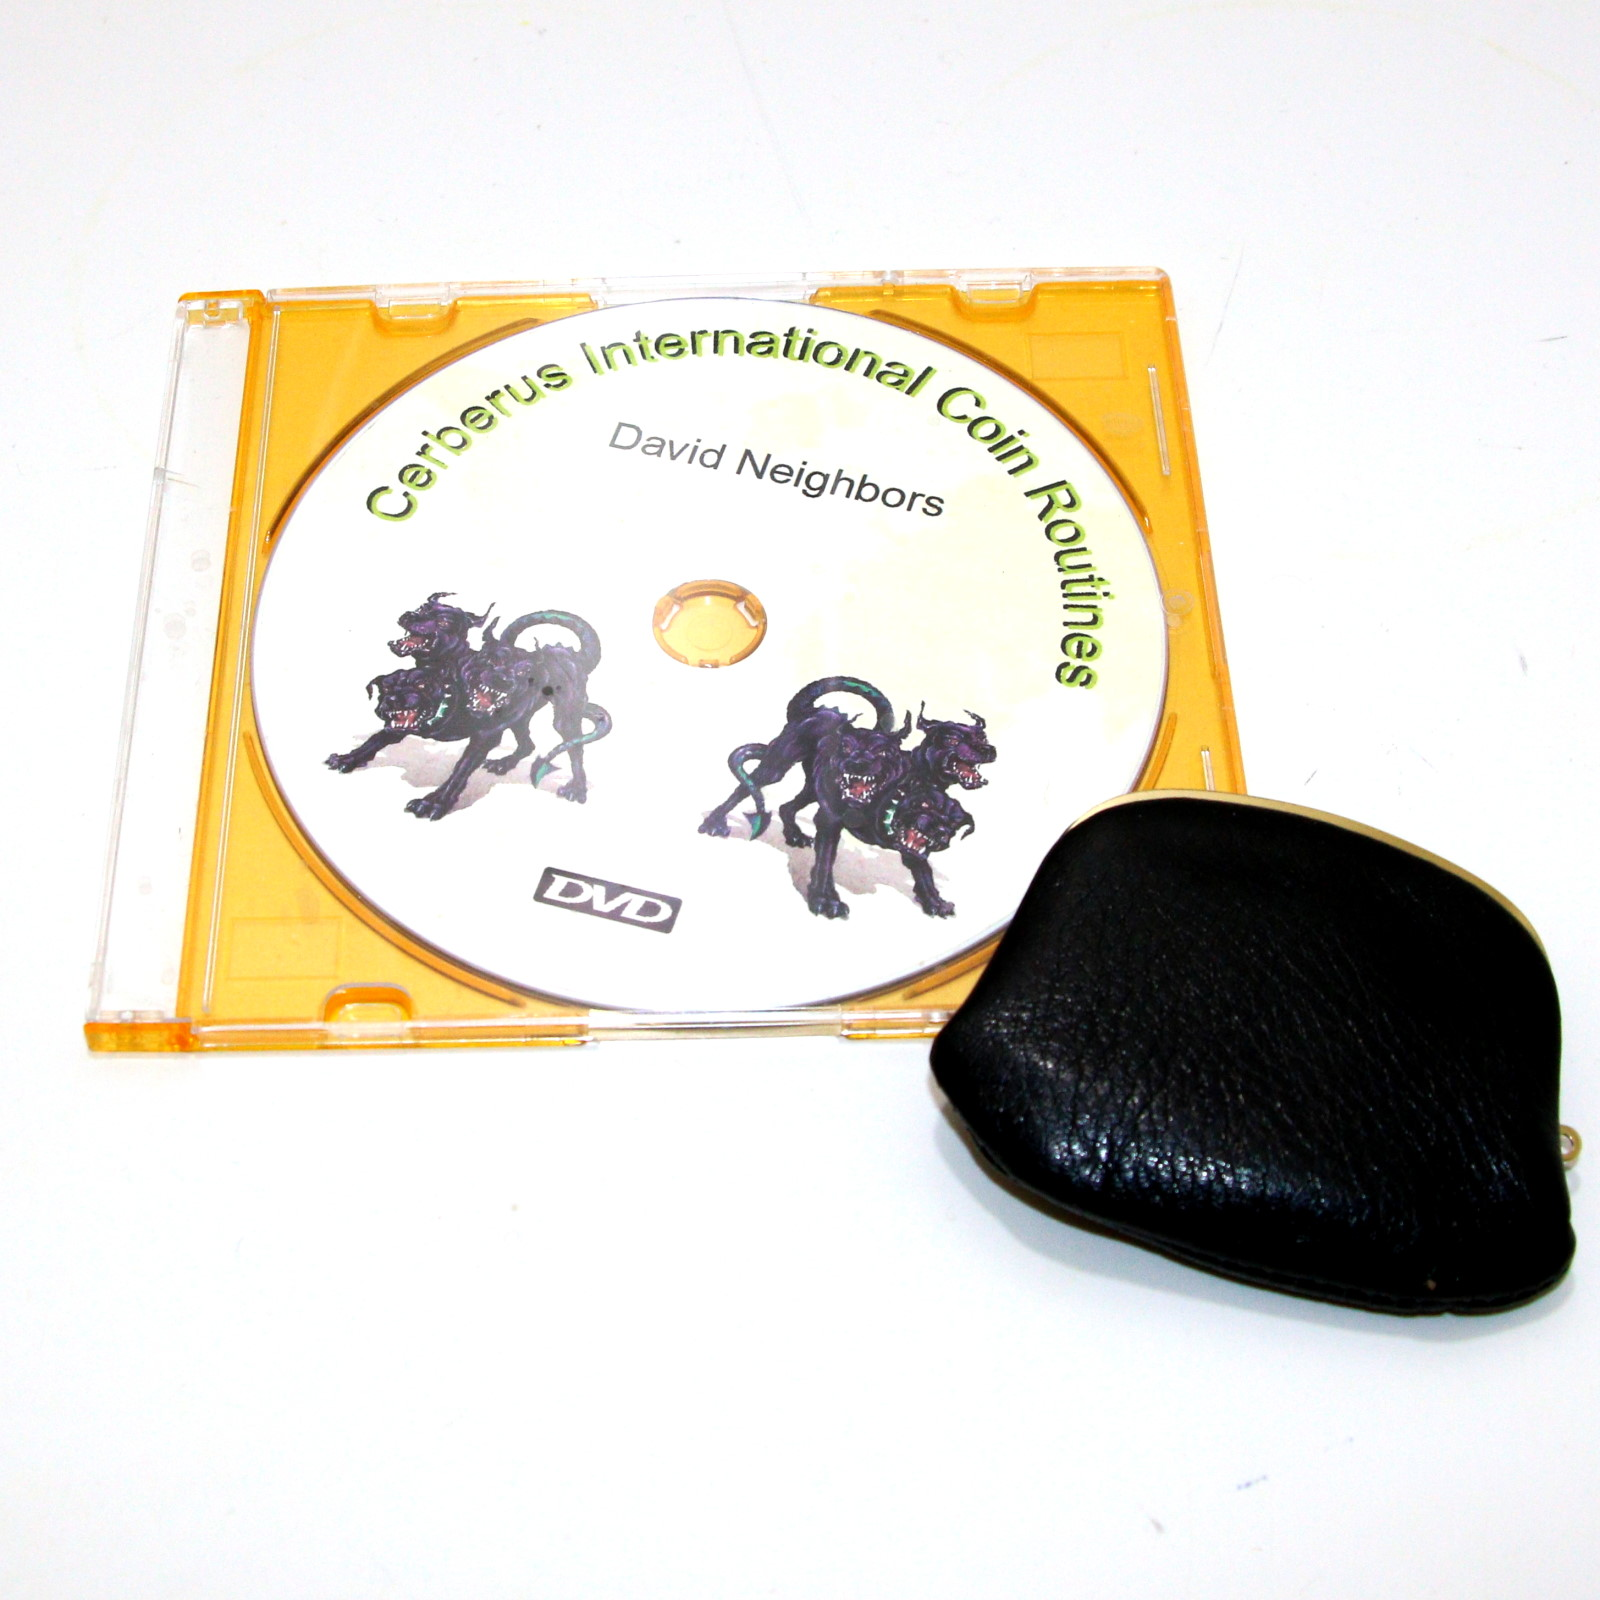 Cerberus with DVD by Todd Lassen, David Neighbors